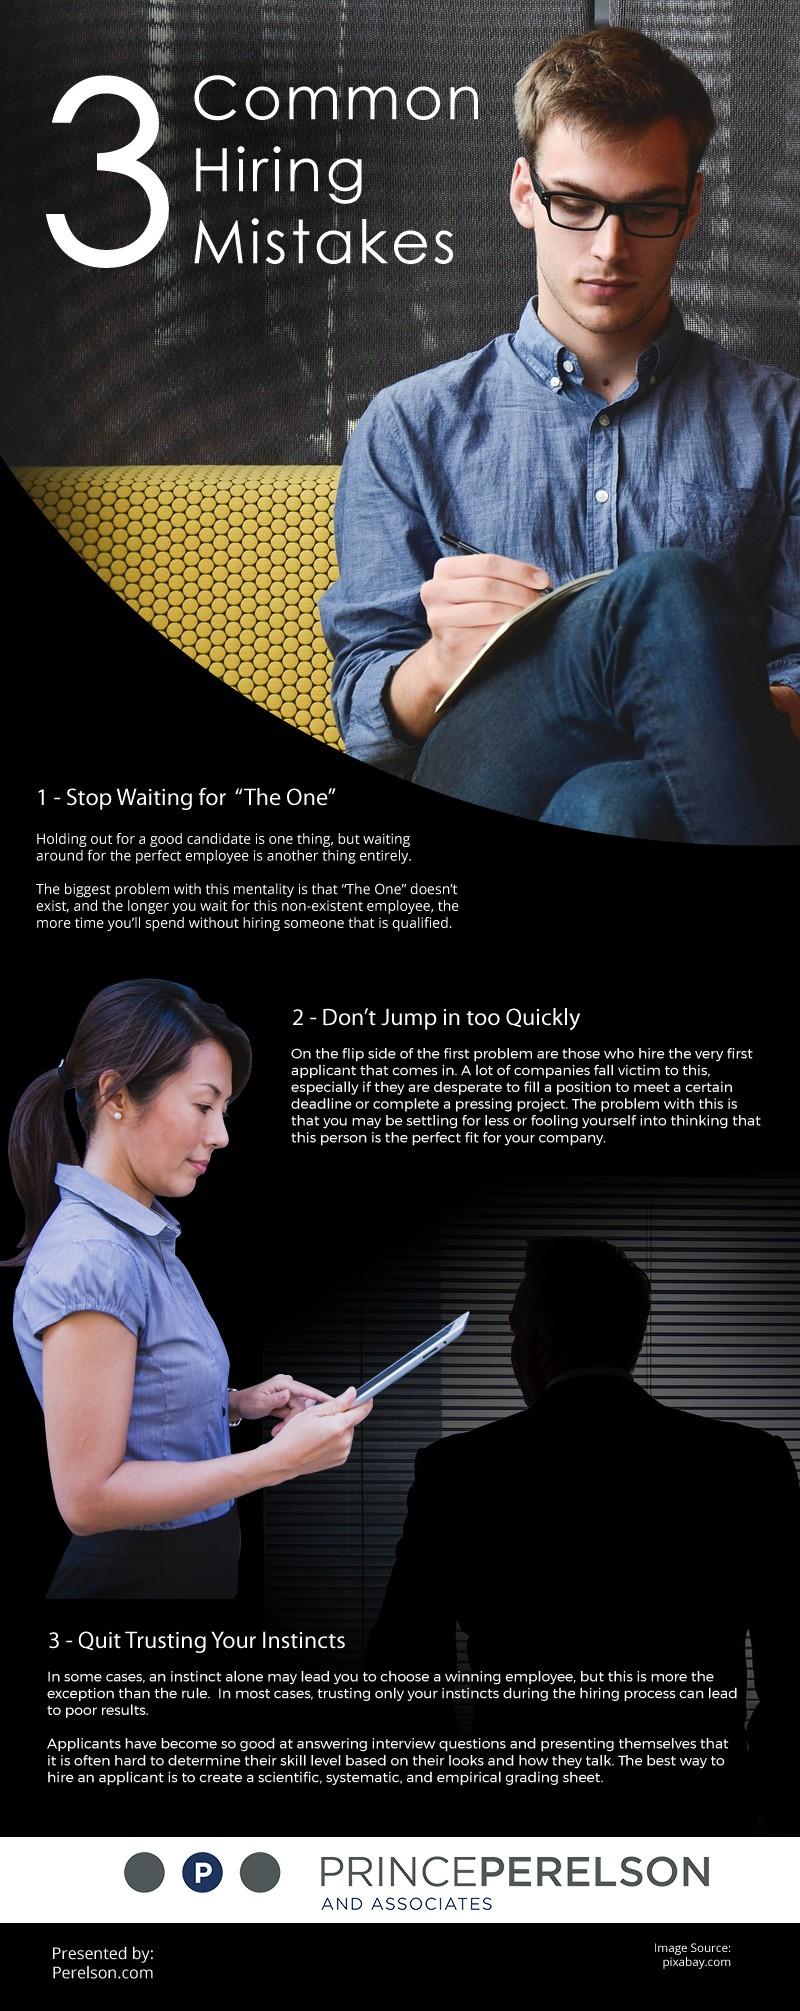 3 Common Hiring Mistakes